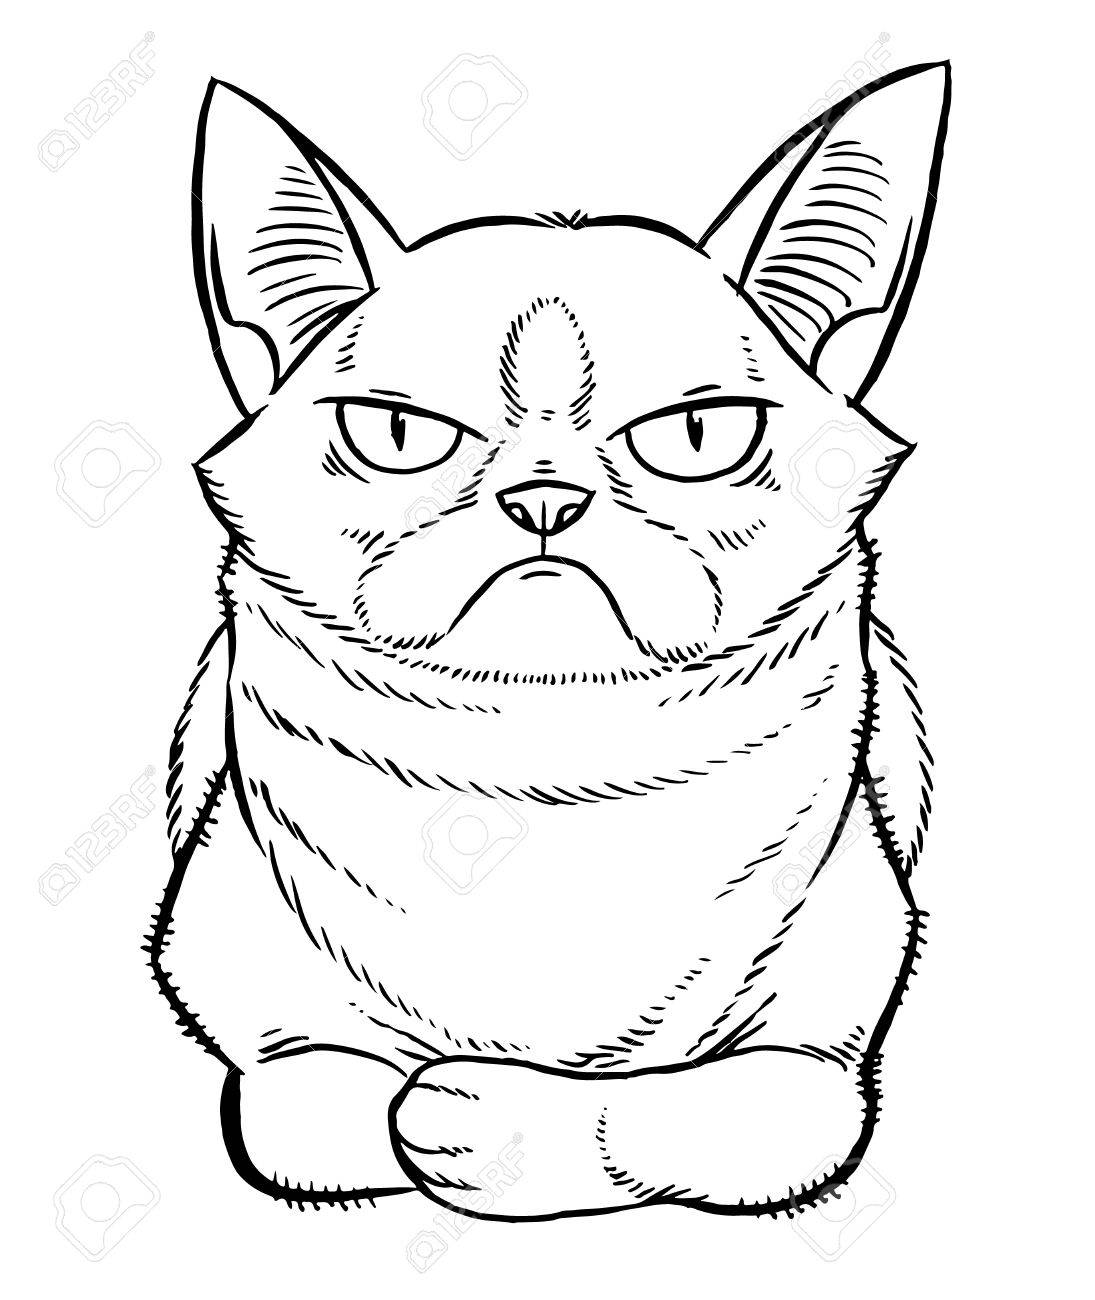 1095x1300 Gloomy Cartoon Cat Sitting